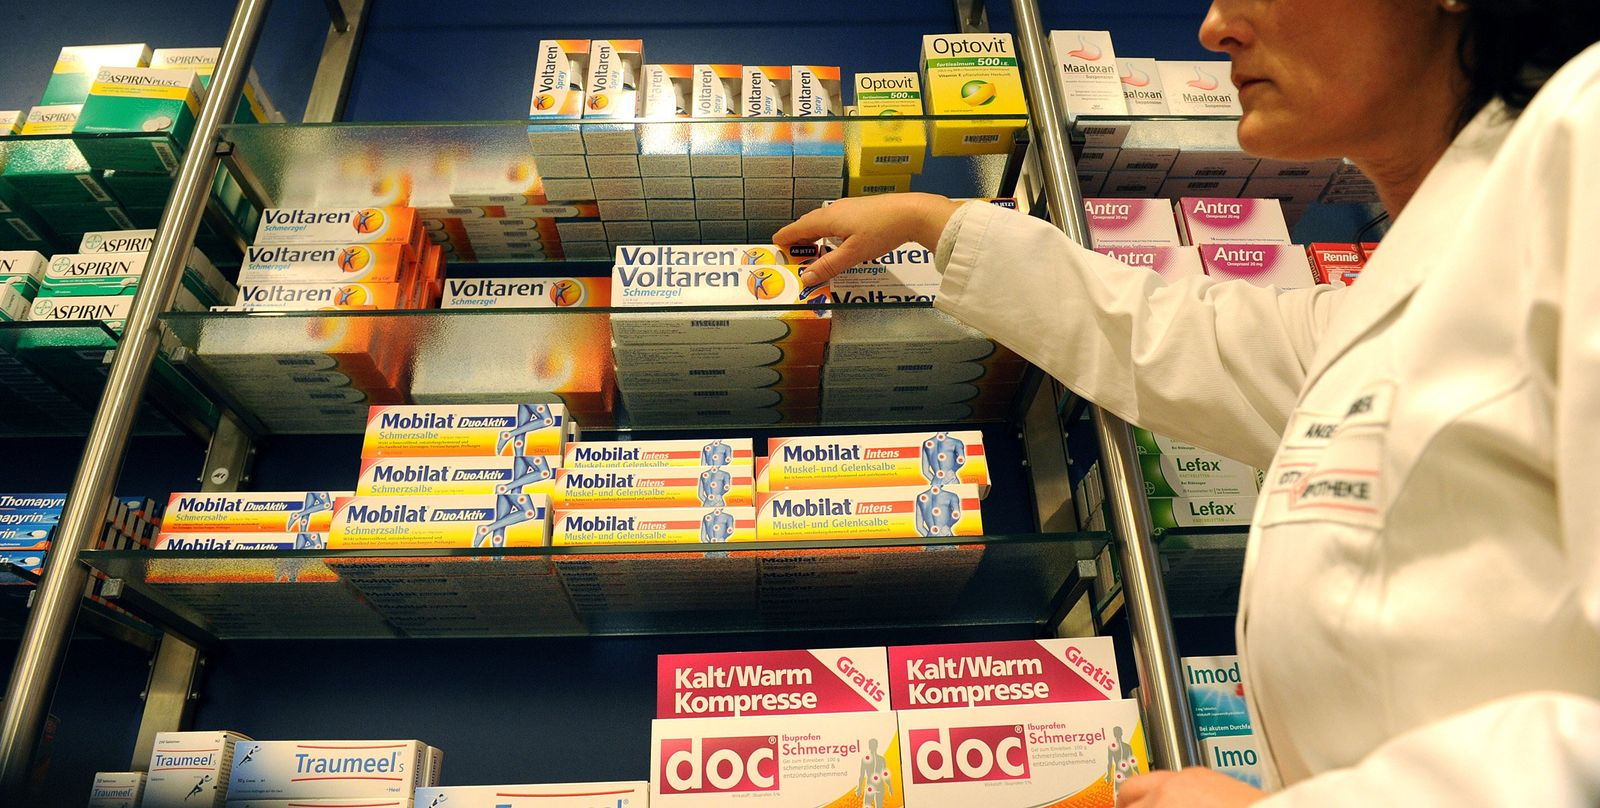 Apotheker / Apothek / Krankenversicherung